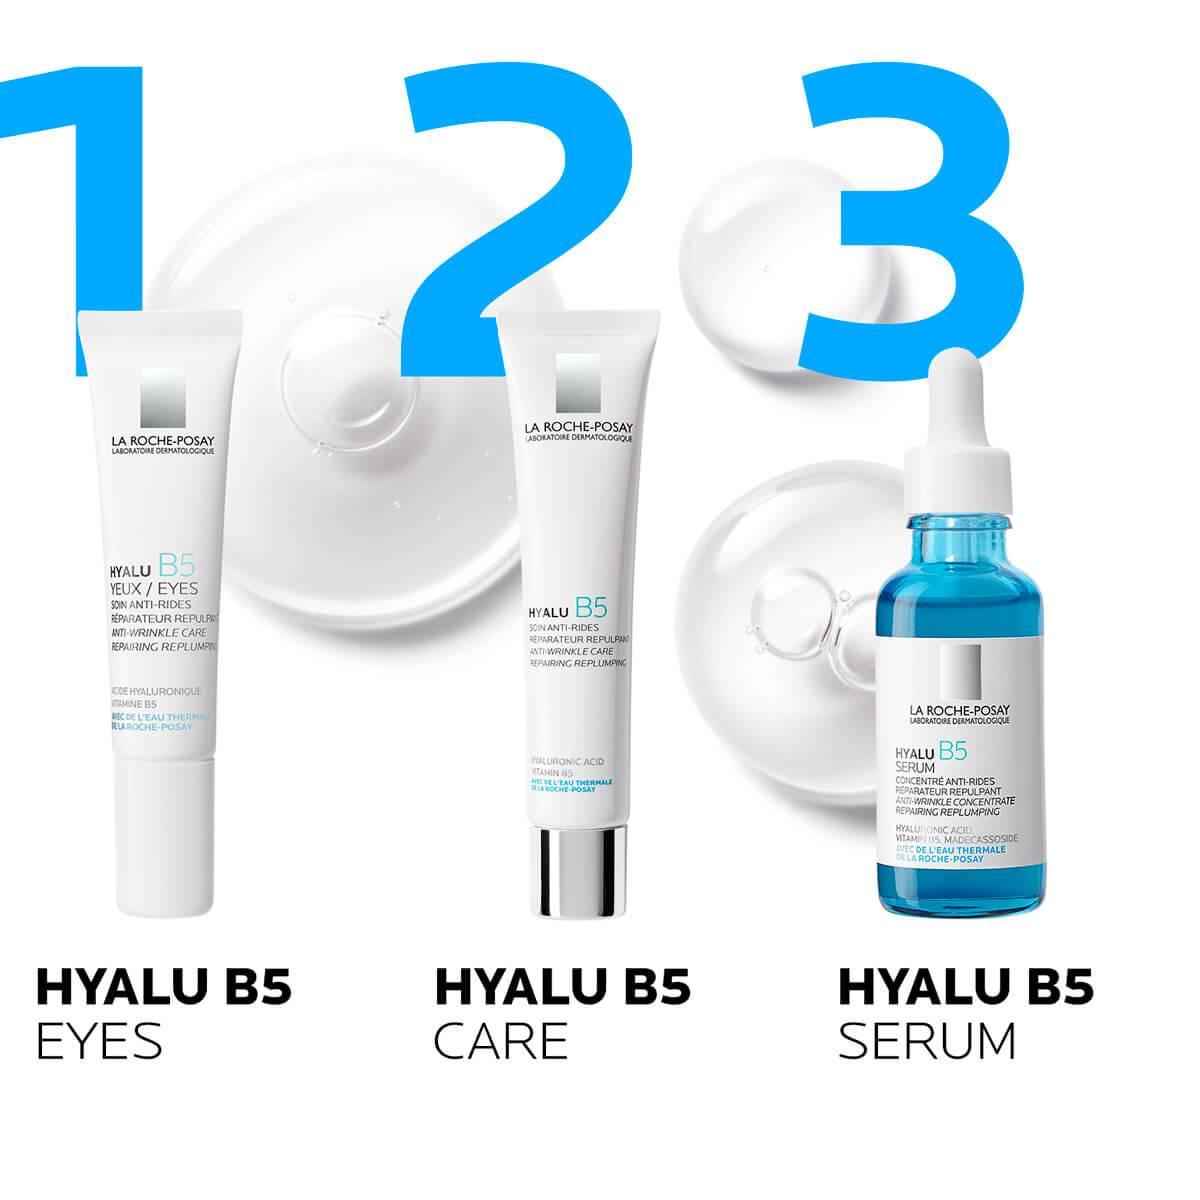 La Roche Posay ProductPage Anti Aging Hyalu B5 Serum 30ml 333787558362 routine